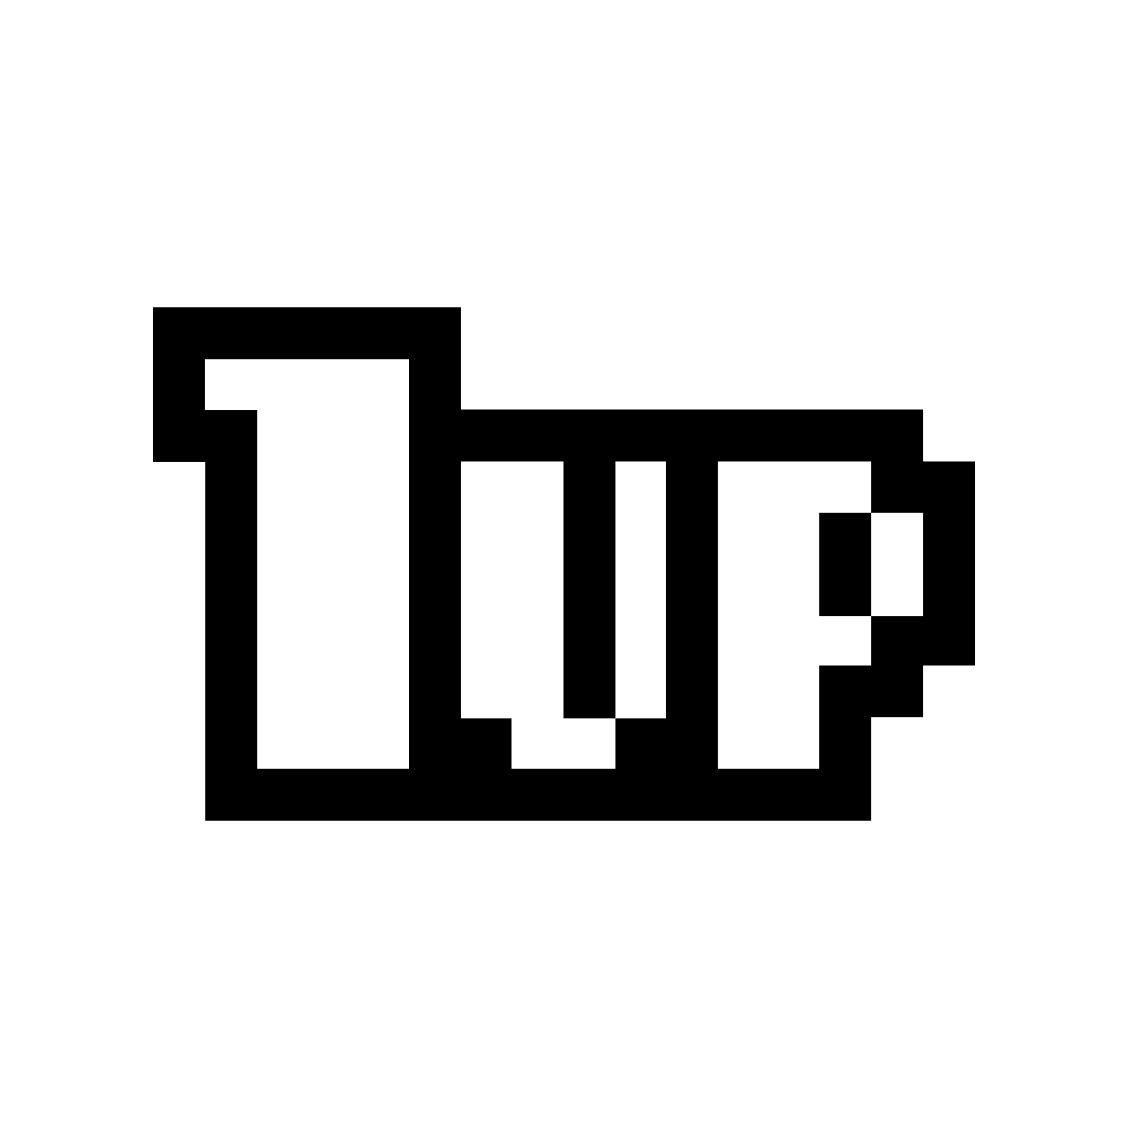 Super Mario Bros One 1 Up graphics design SVG.